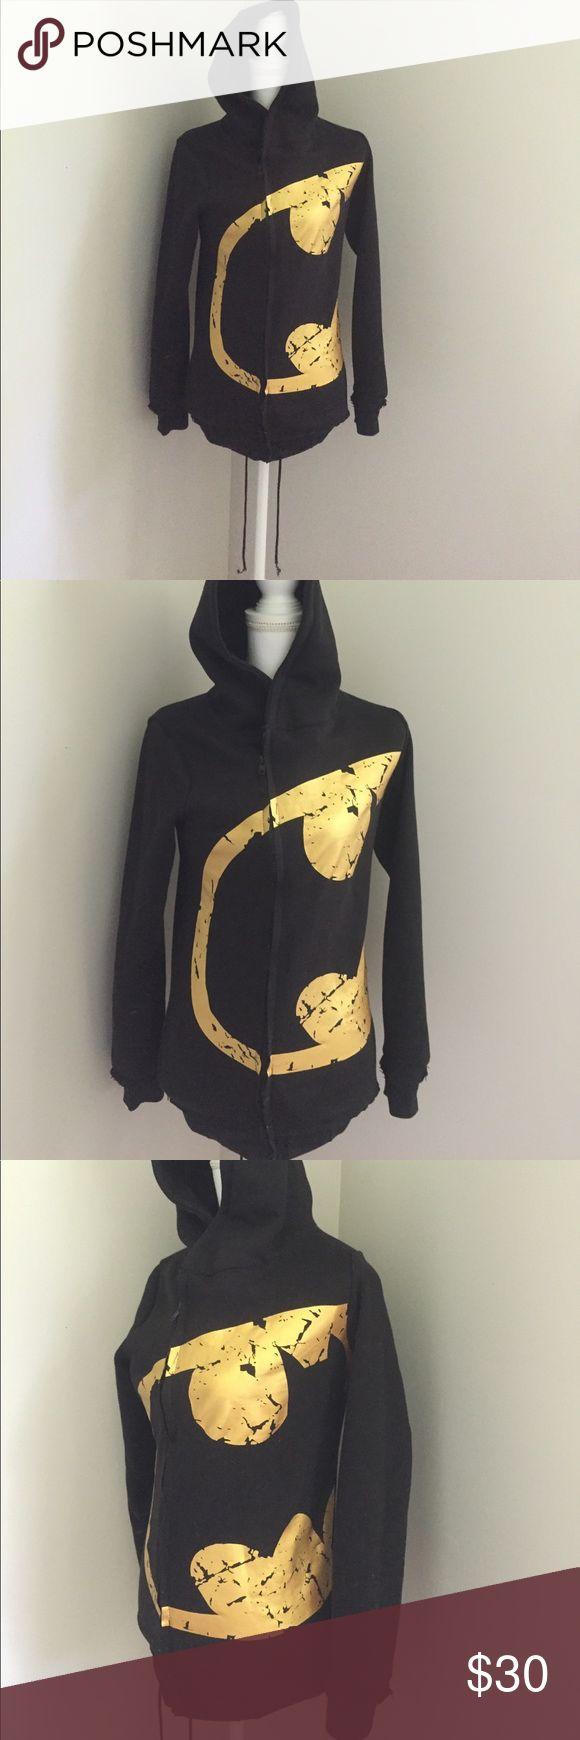 Asymmetrical batman hoodie s/m runs small Asymmetrical batman hoodie s/m runs small. Preowned. Drawstring on bottom to tighten/loosen. Other